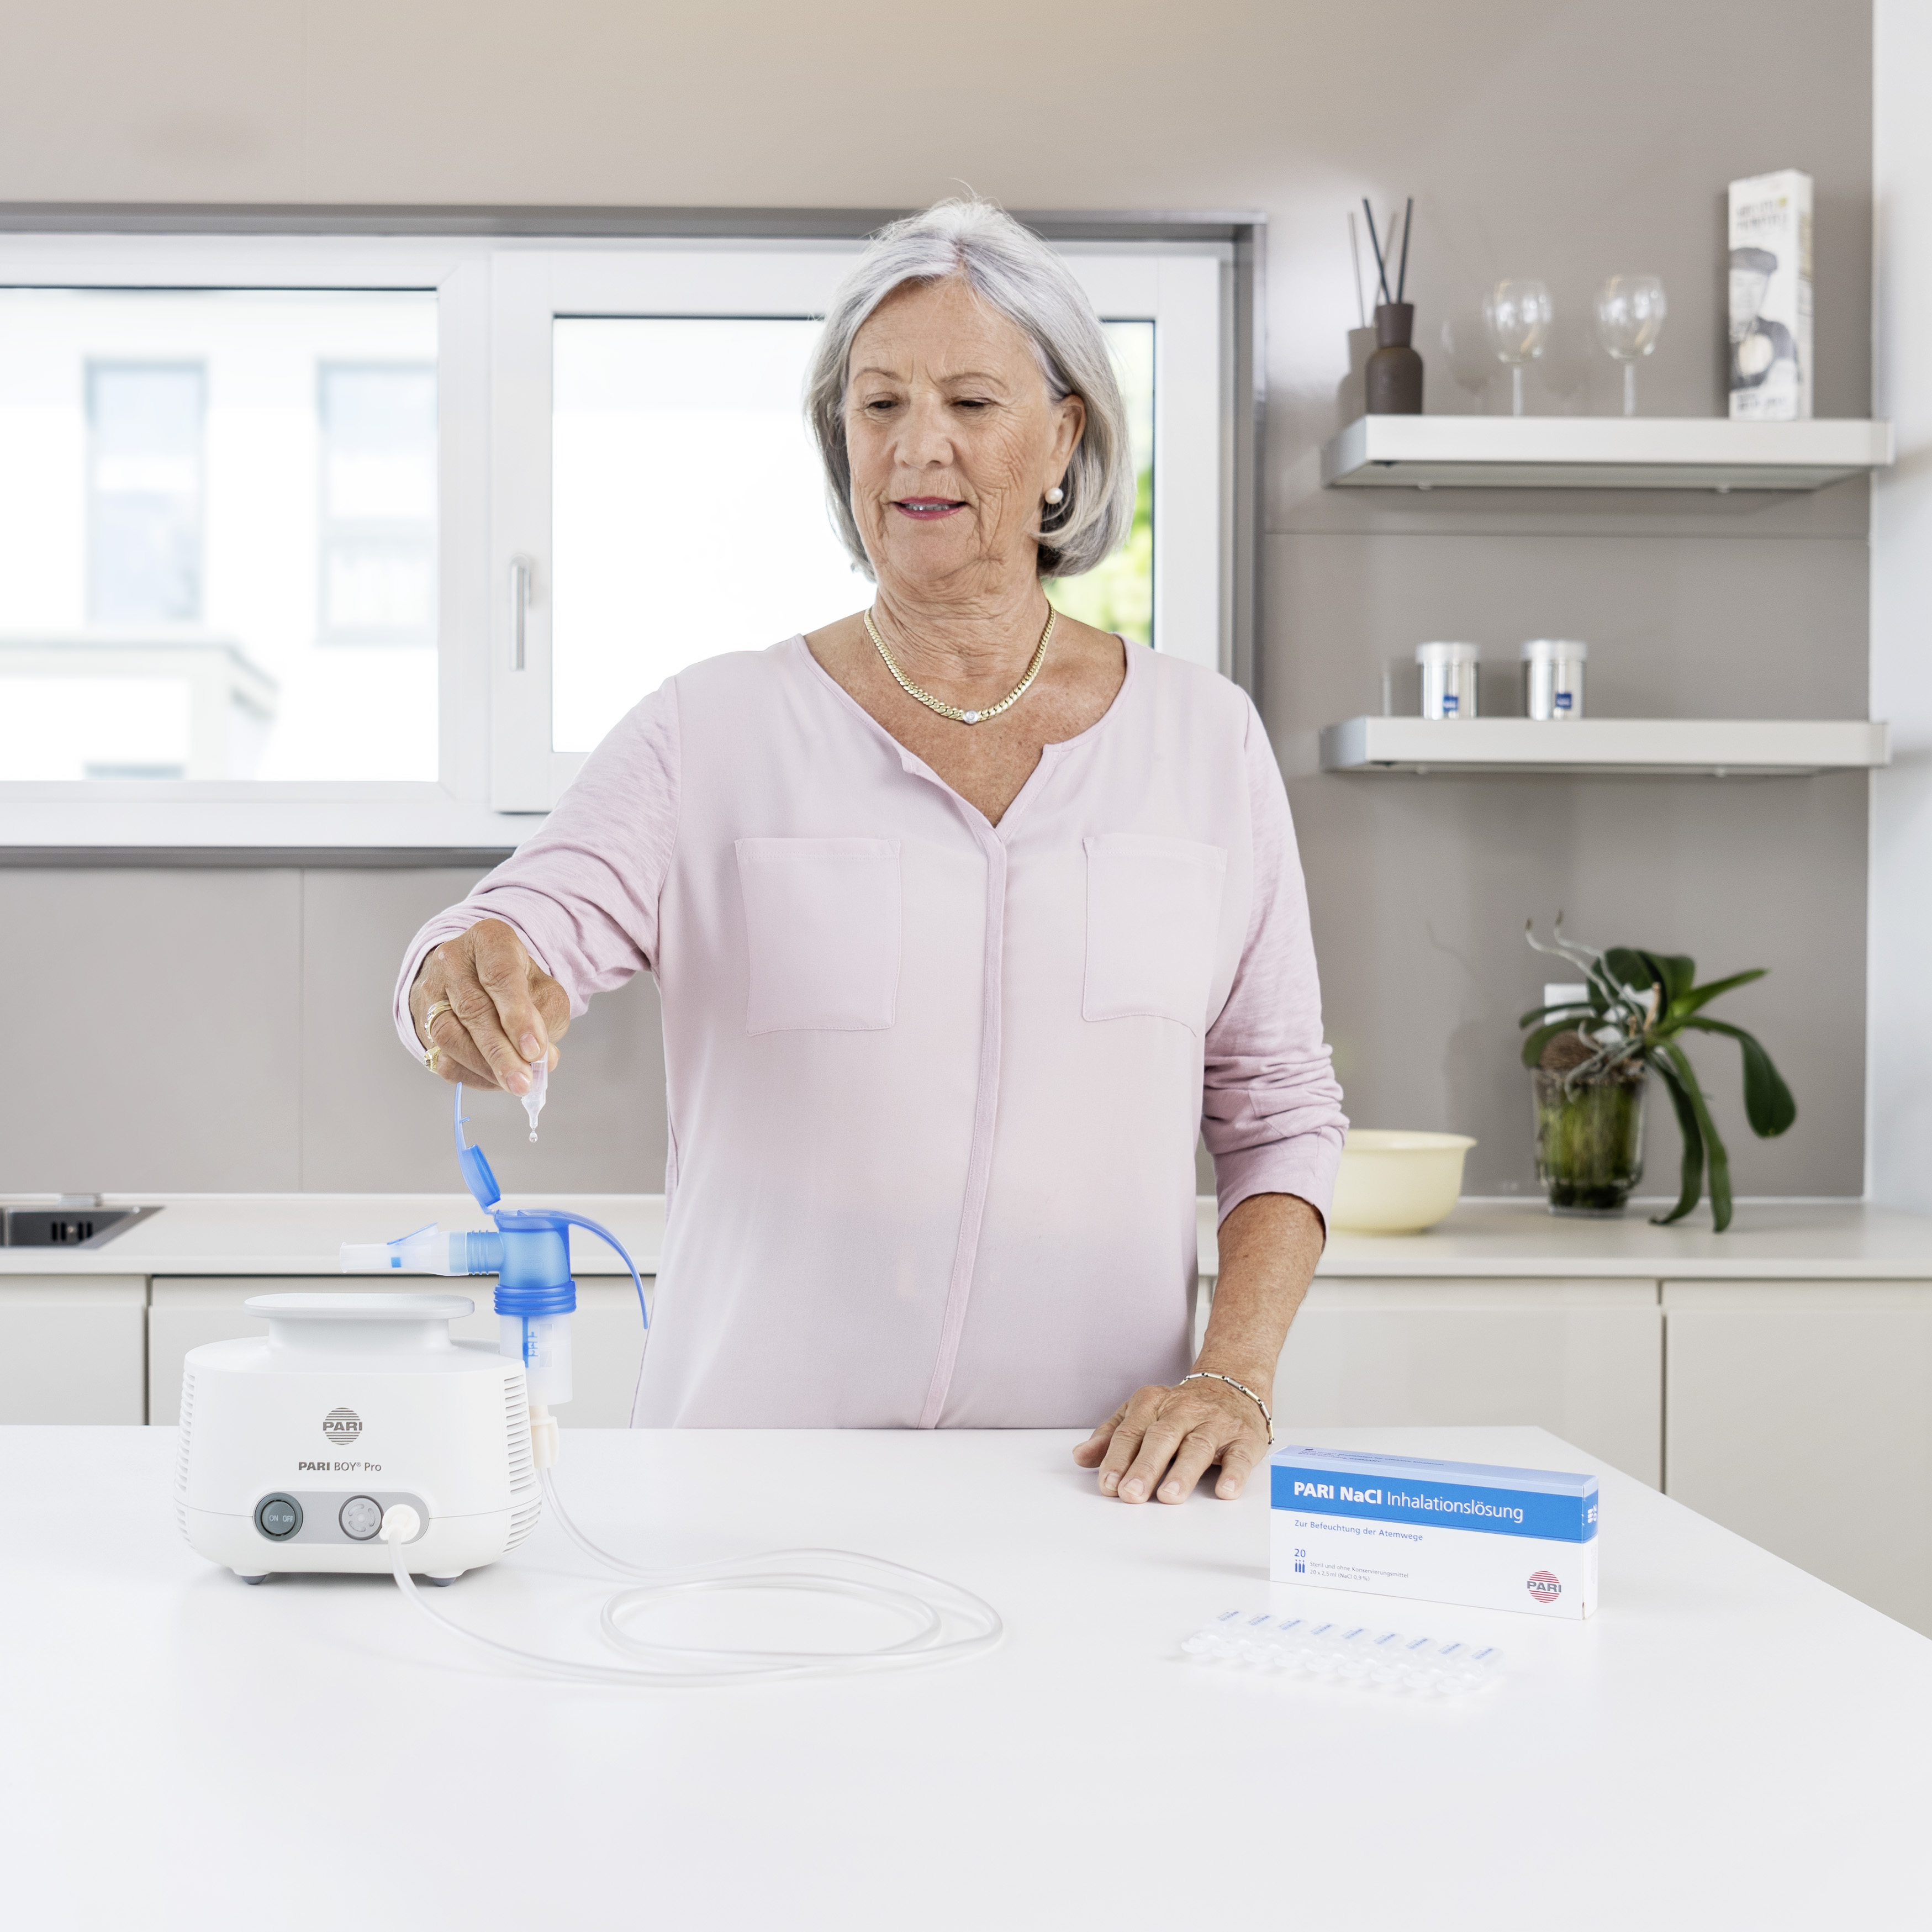 Older-woman-fills-up-the-PARI-BOY-Pro.jpg